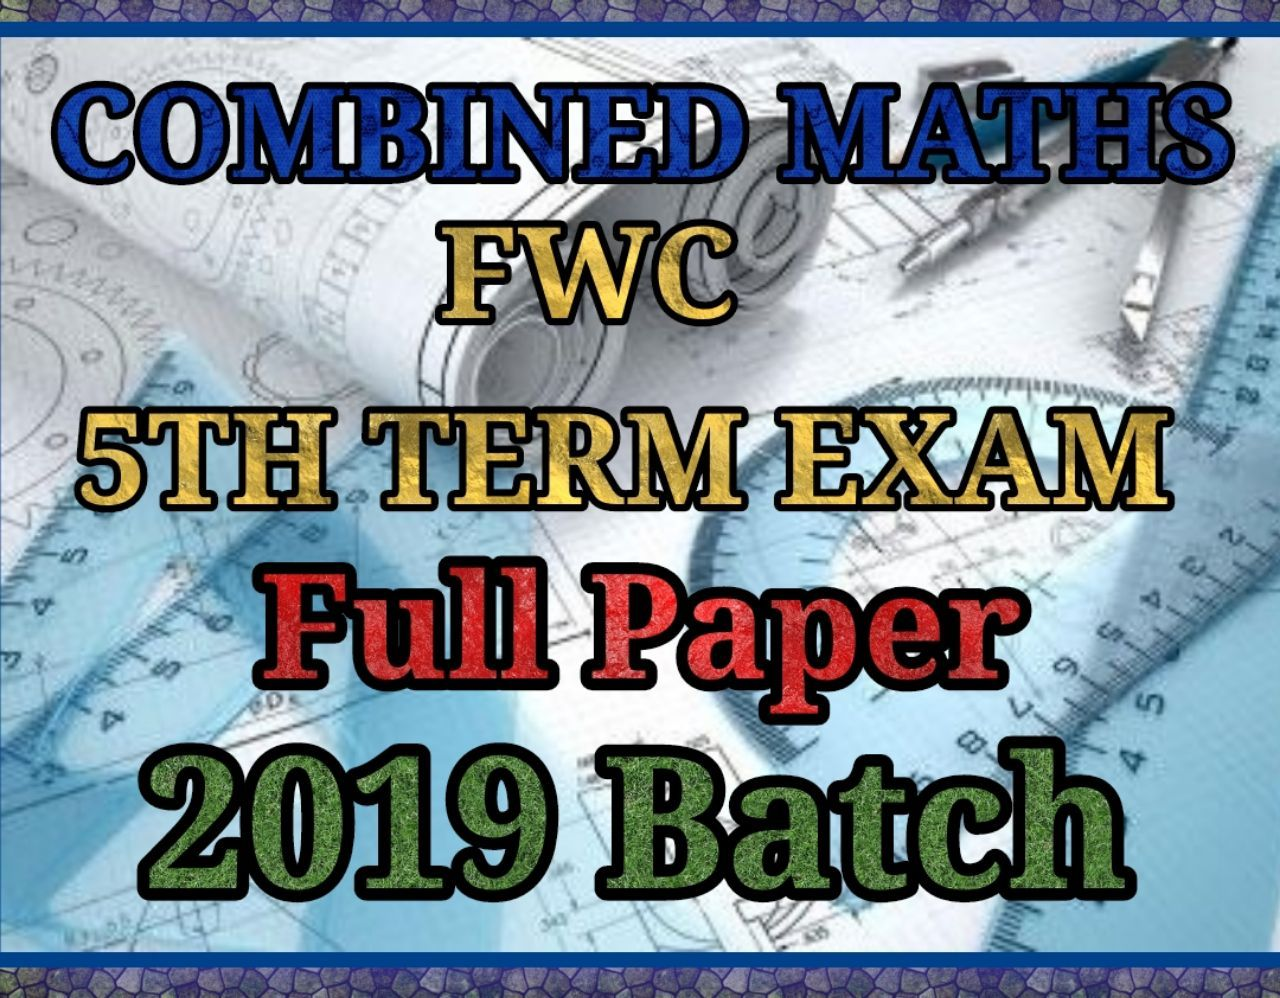 COMBINED MATHS_FWC 2019 BATCH 5TH TERM EXAM - SCIENCE ORBIT